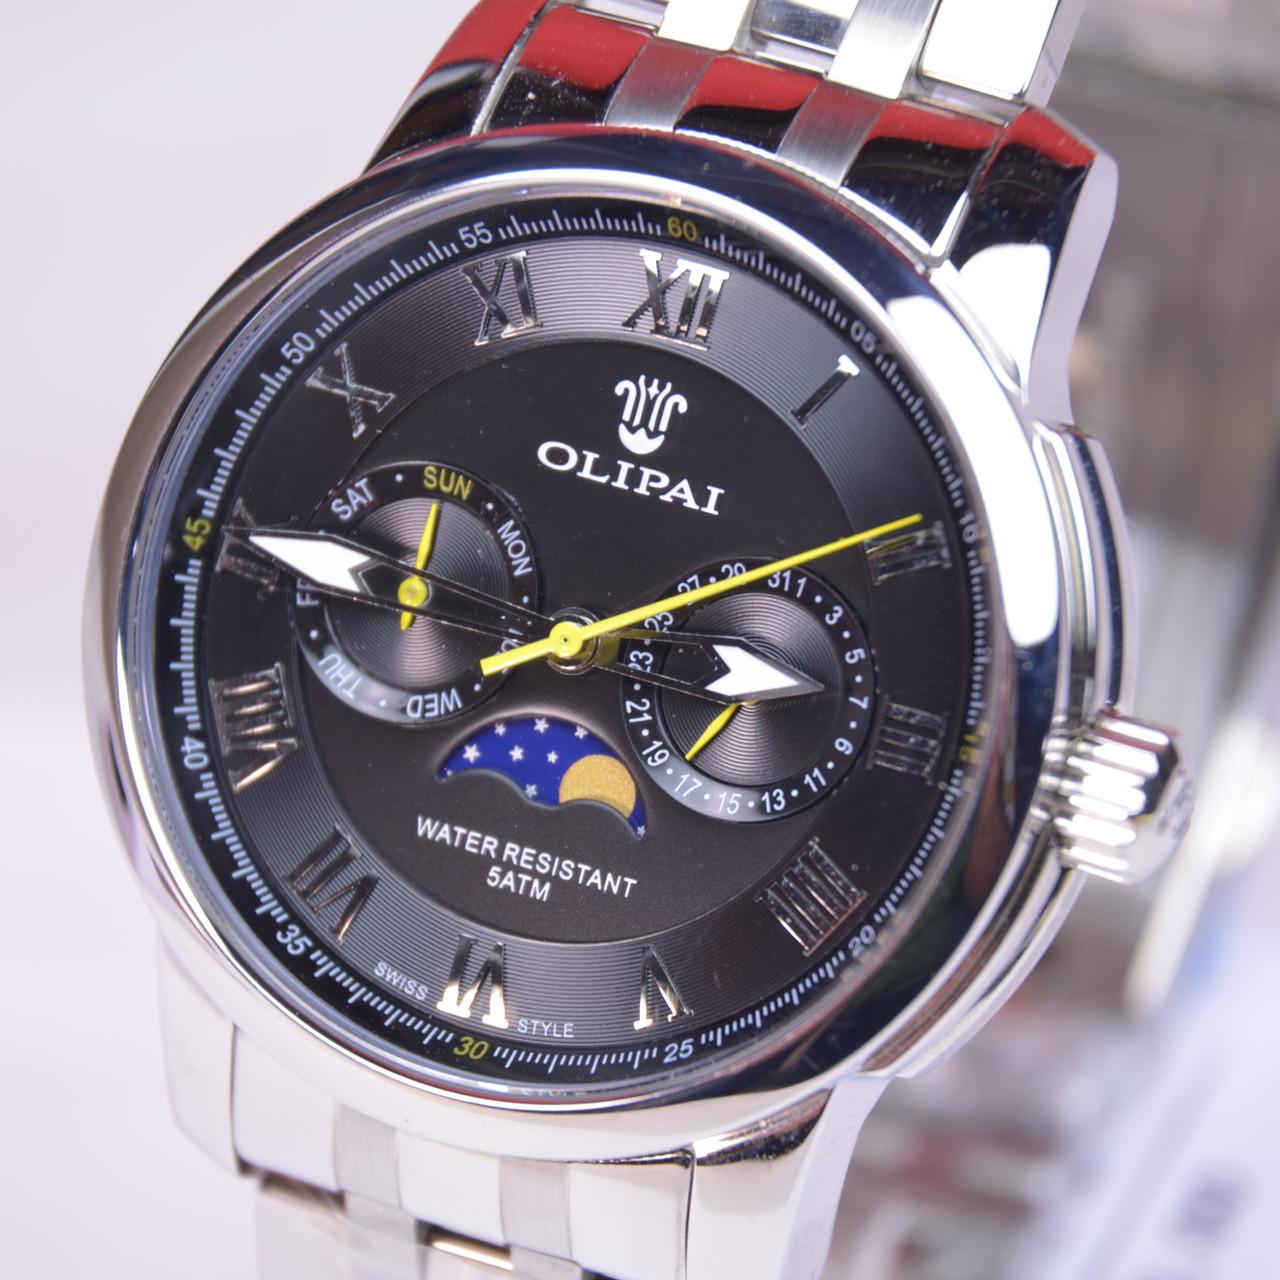 b306bf9d Мужские наручные часы OLIPAI JT6001 стекло сапфир - интернет- магазин